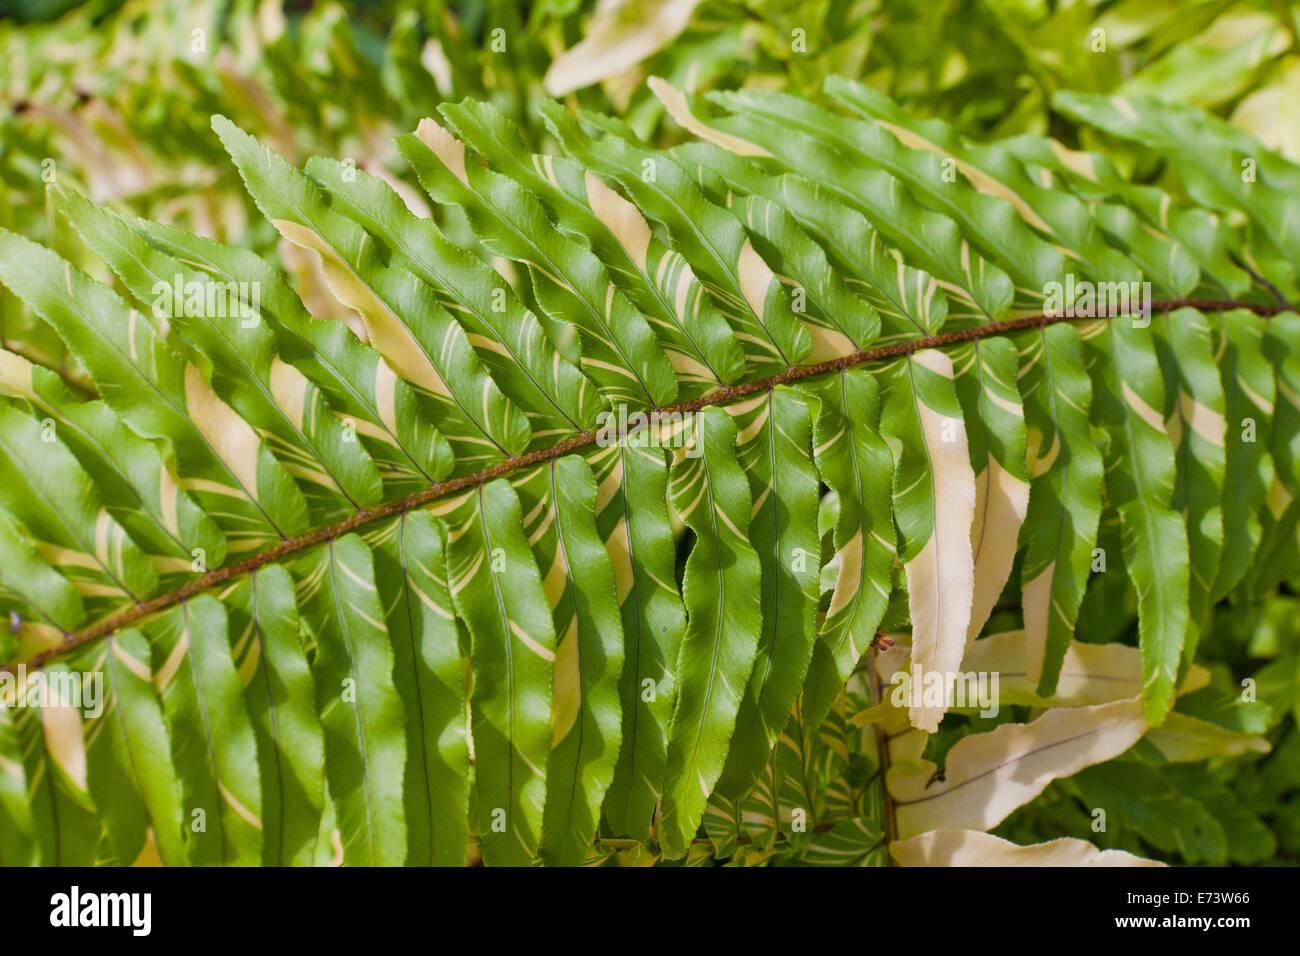 Zamburiña Boston (hojas de helecho Nephrolepis exaltata variegata) - EE.UU. Imagen De Stock